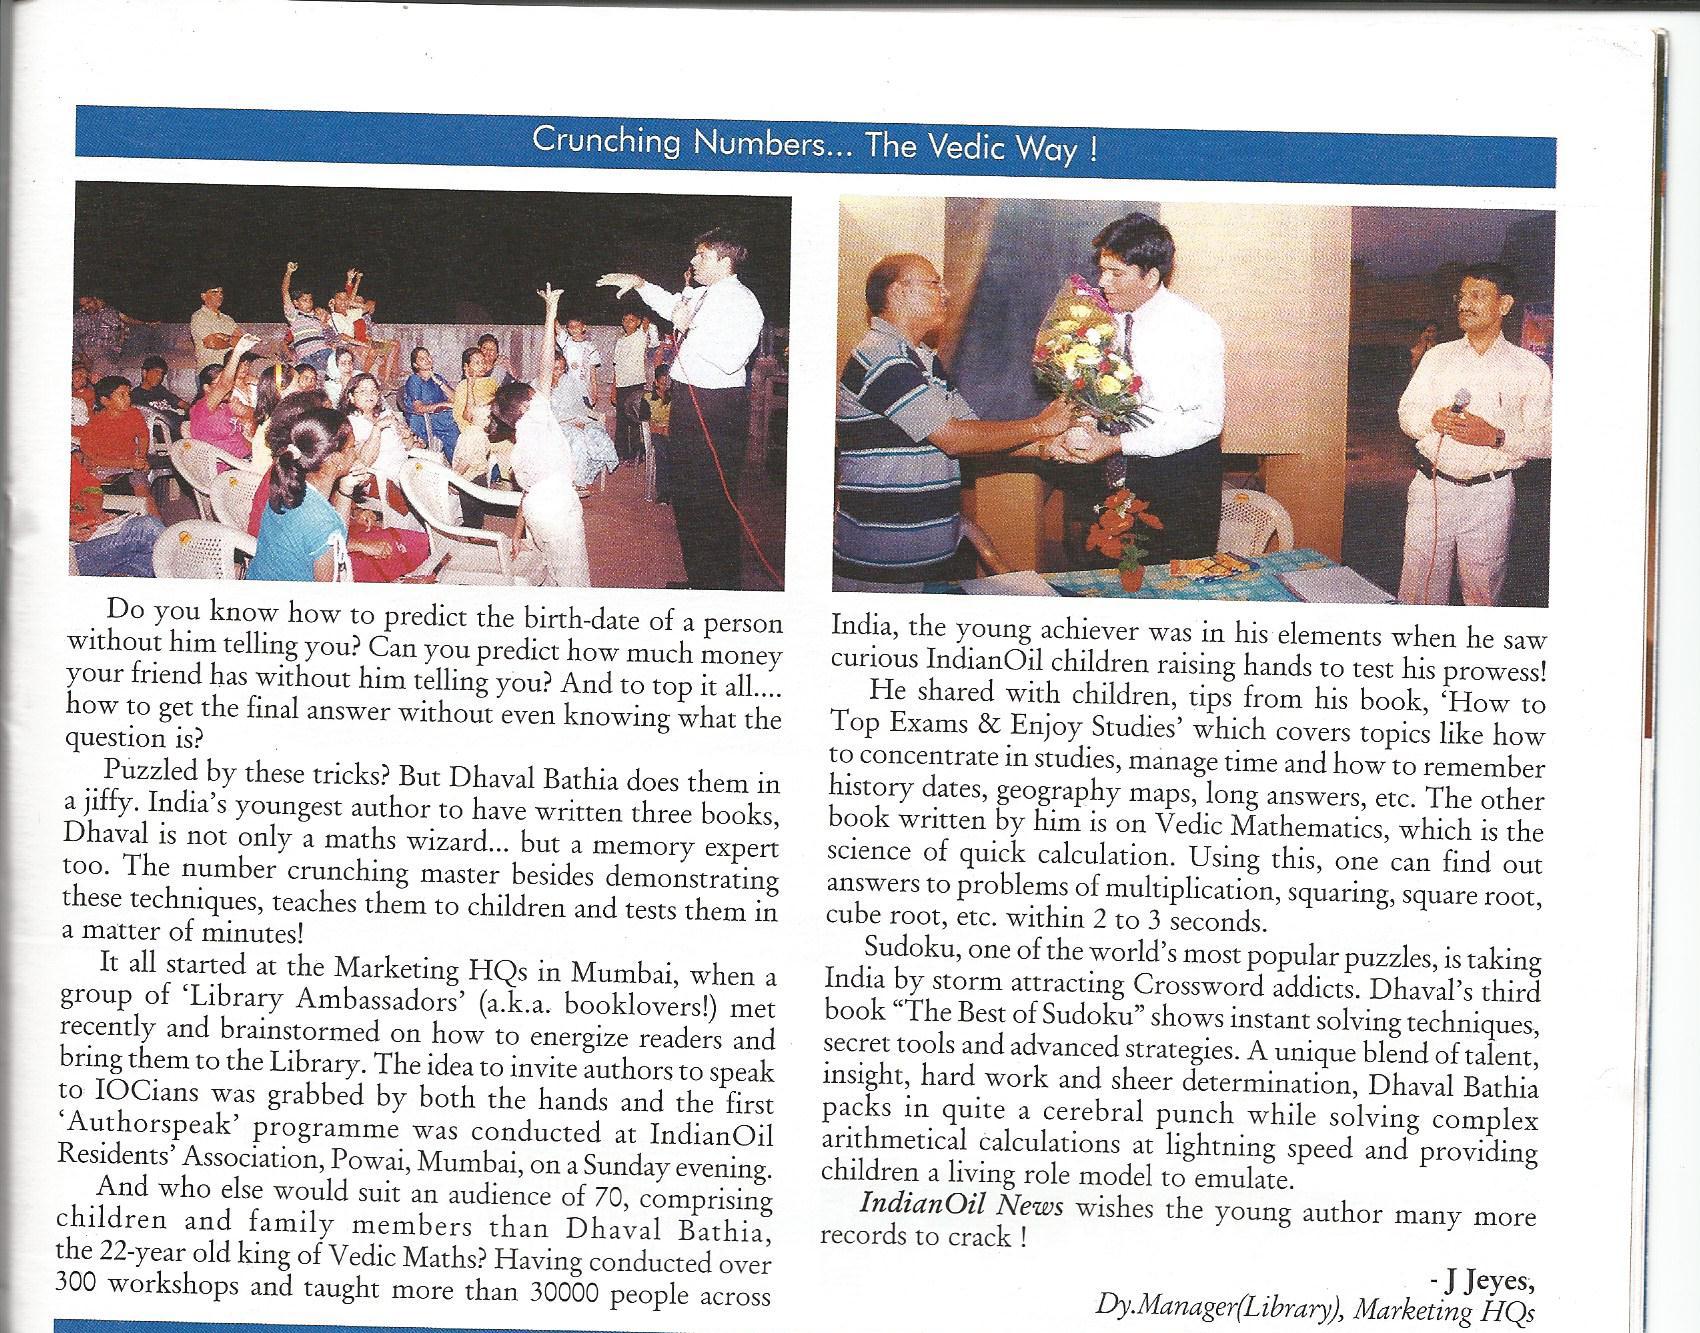 Indian Oil Magazine